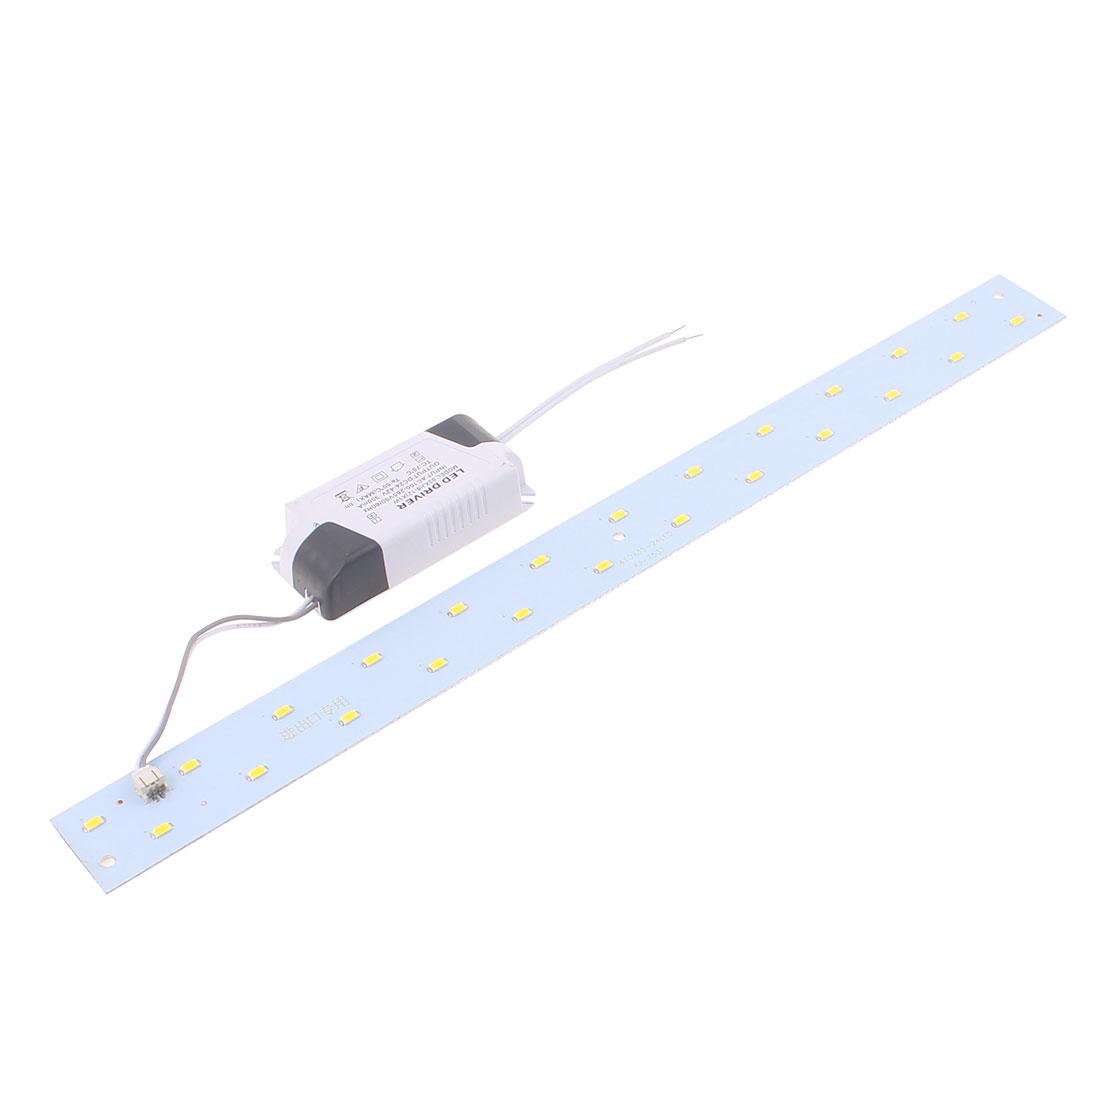 AC100~265V 12W LED Ceiling light Panel 2 Rows Long Strip Retrofit Plate Warm White 40cm